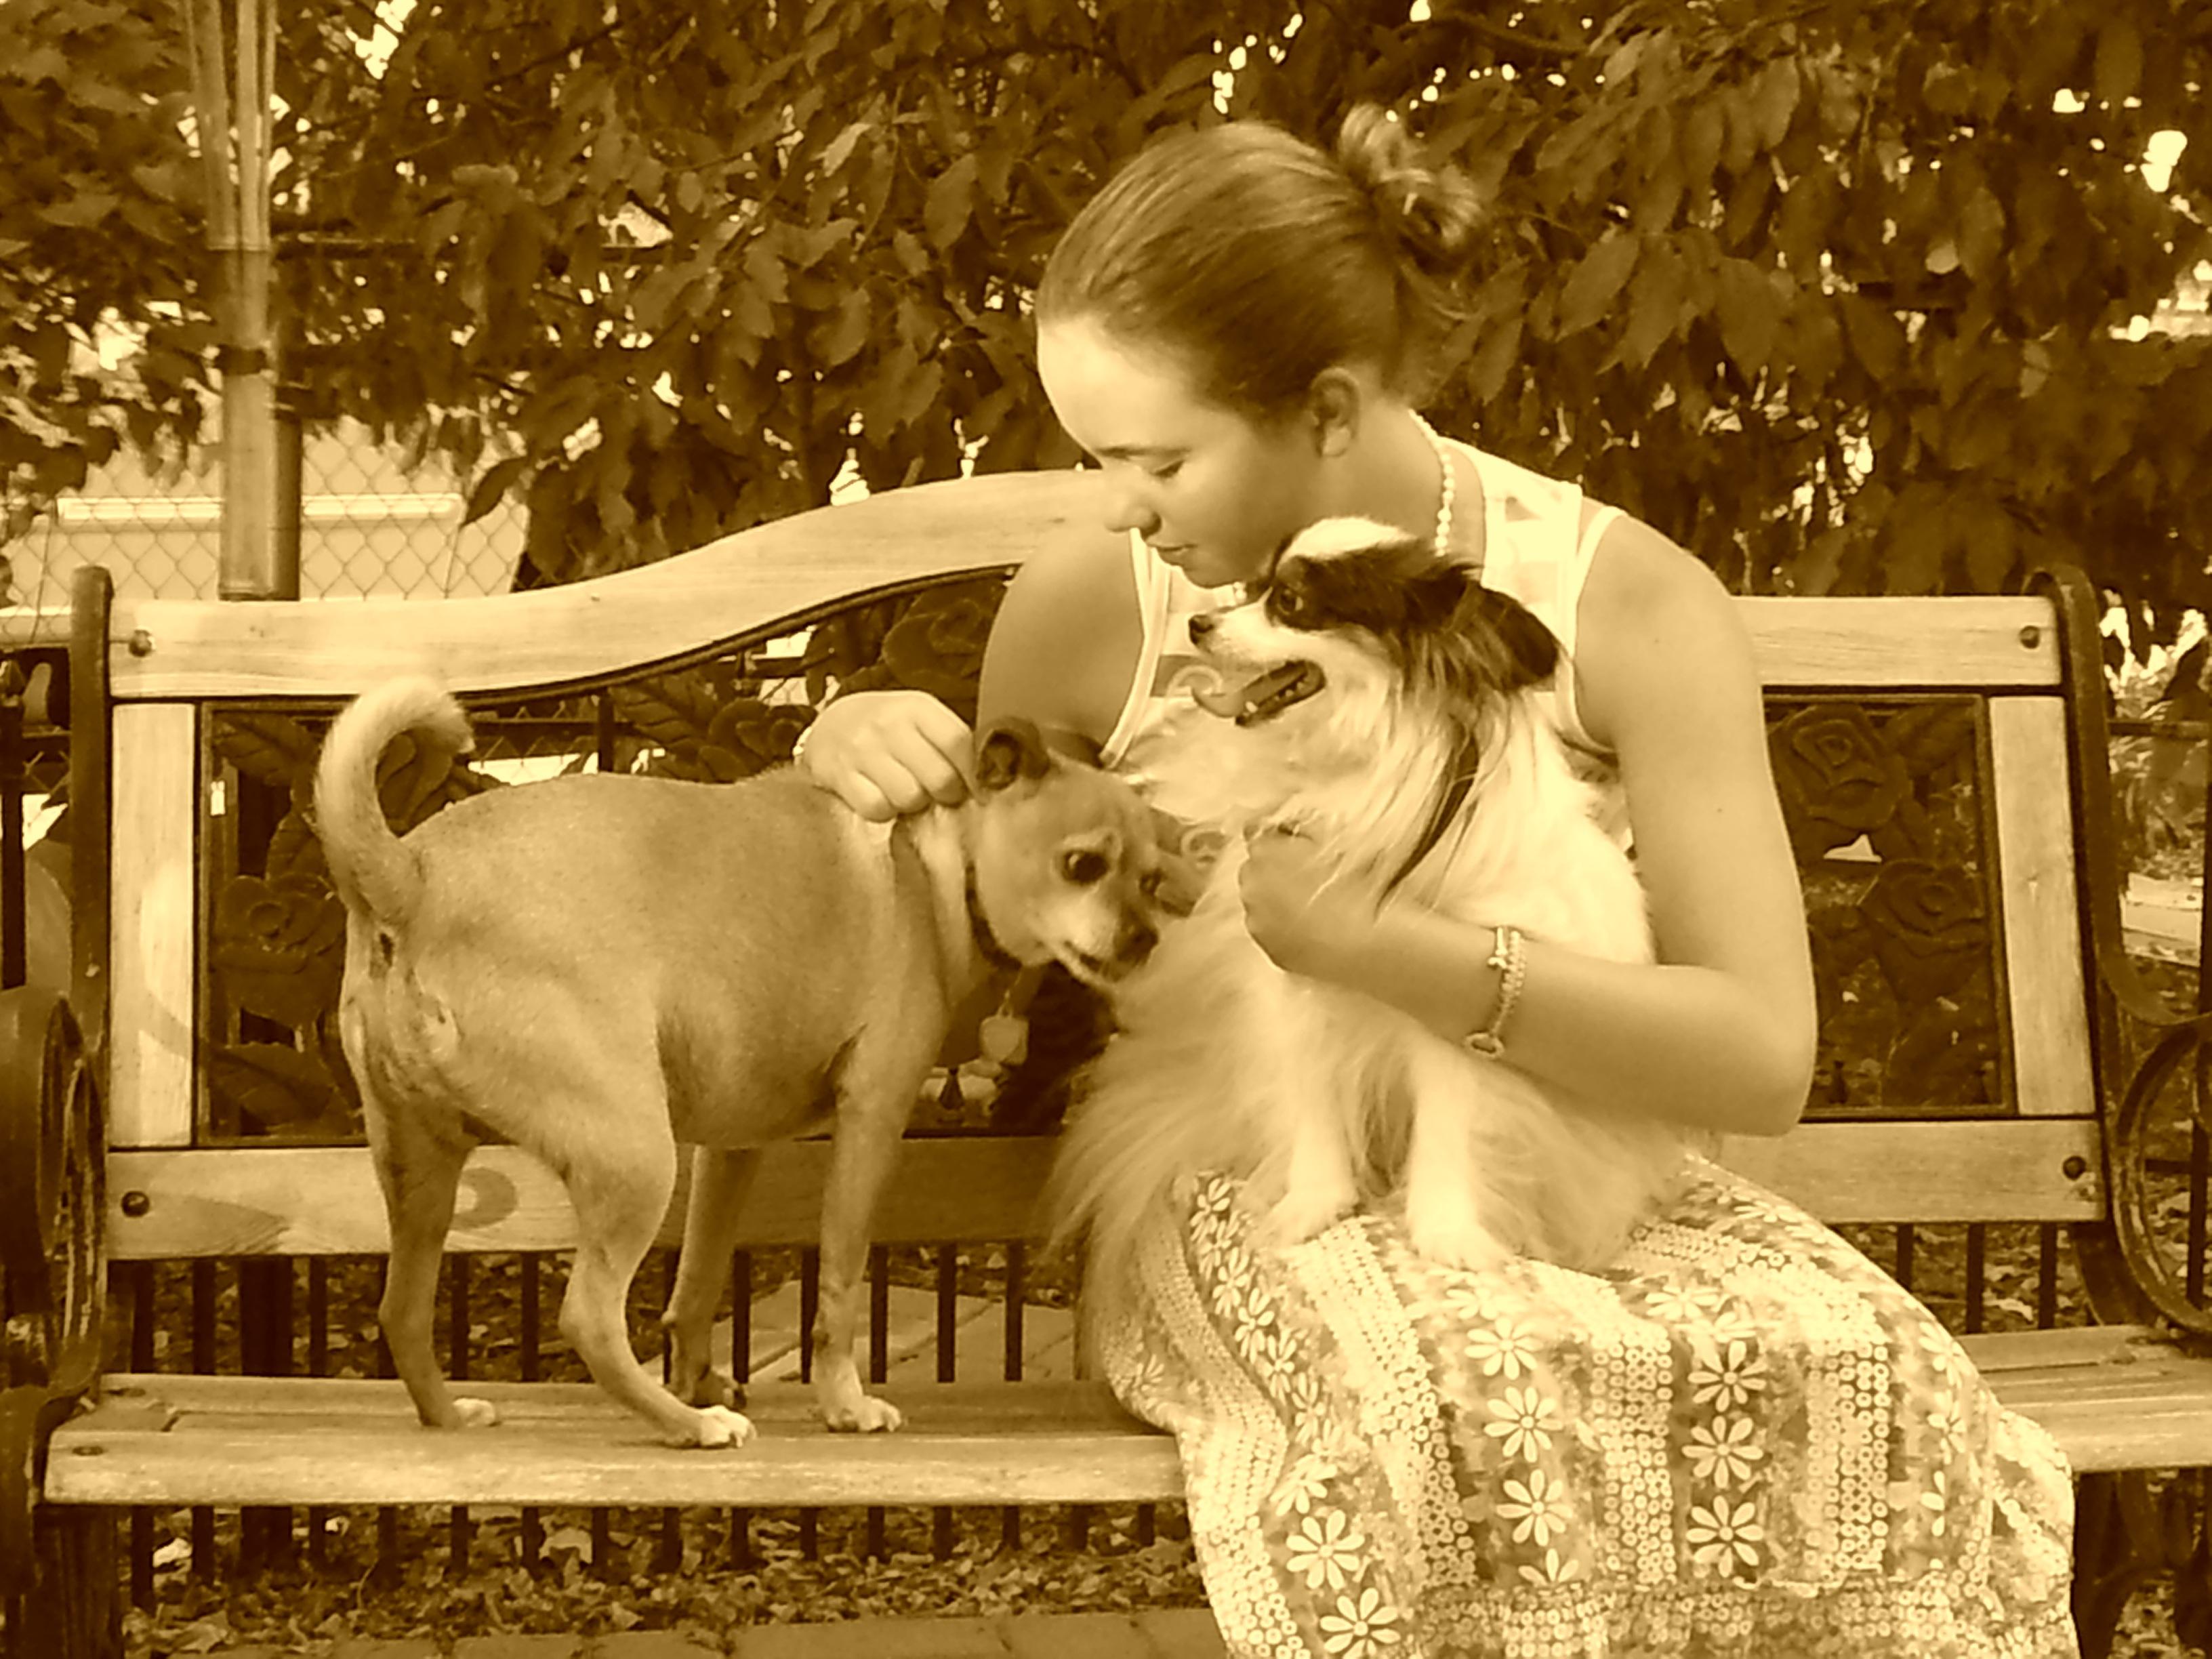 Kostenlose foto : Person, Menschen, Kind, Tier, Haustier, Porträt ...